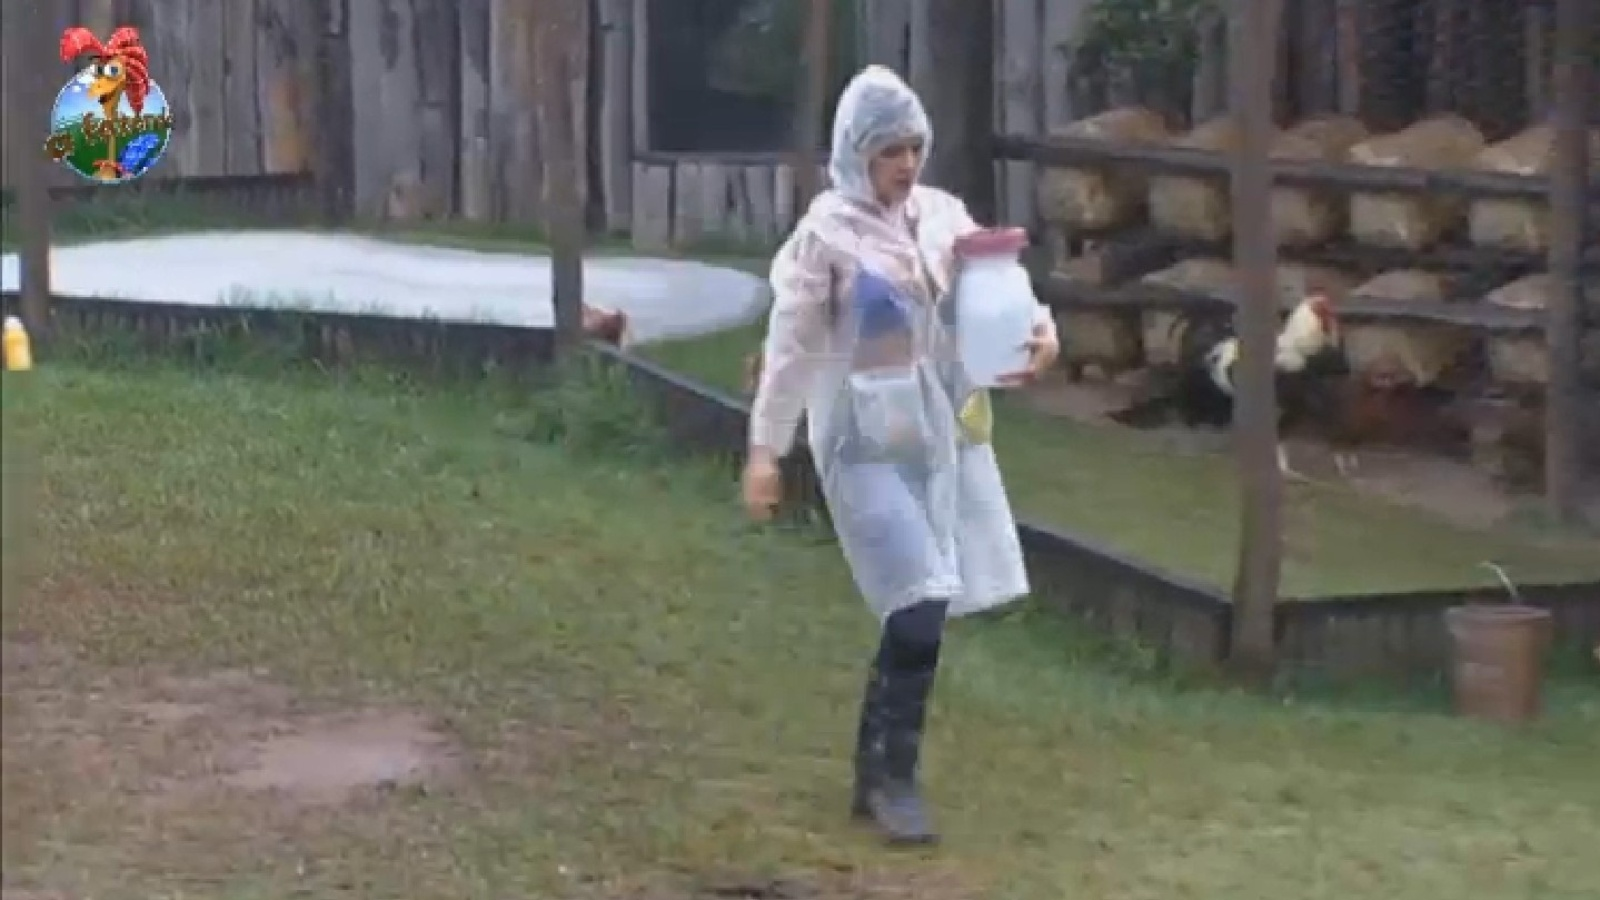 17.set.2013 - Fazendeira da semana, Denise Rocha cuida das aves